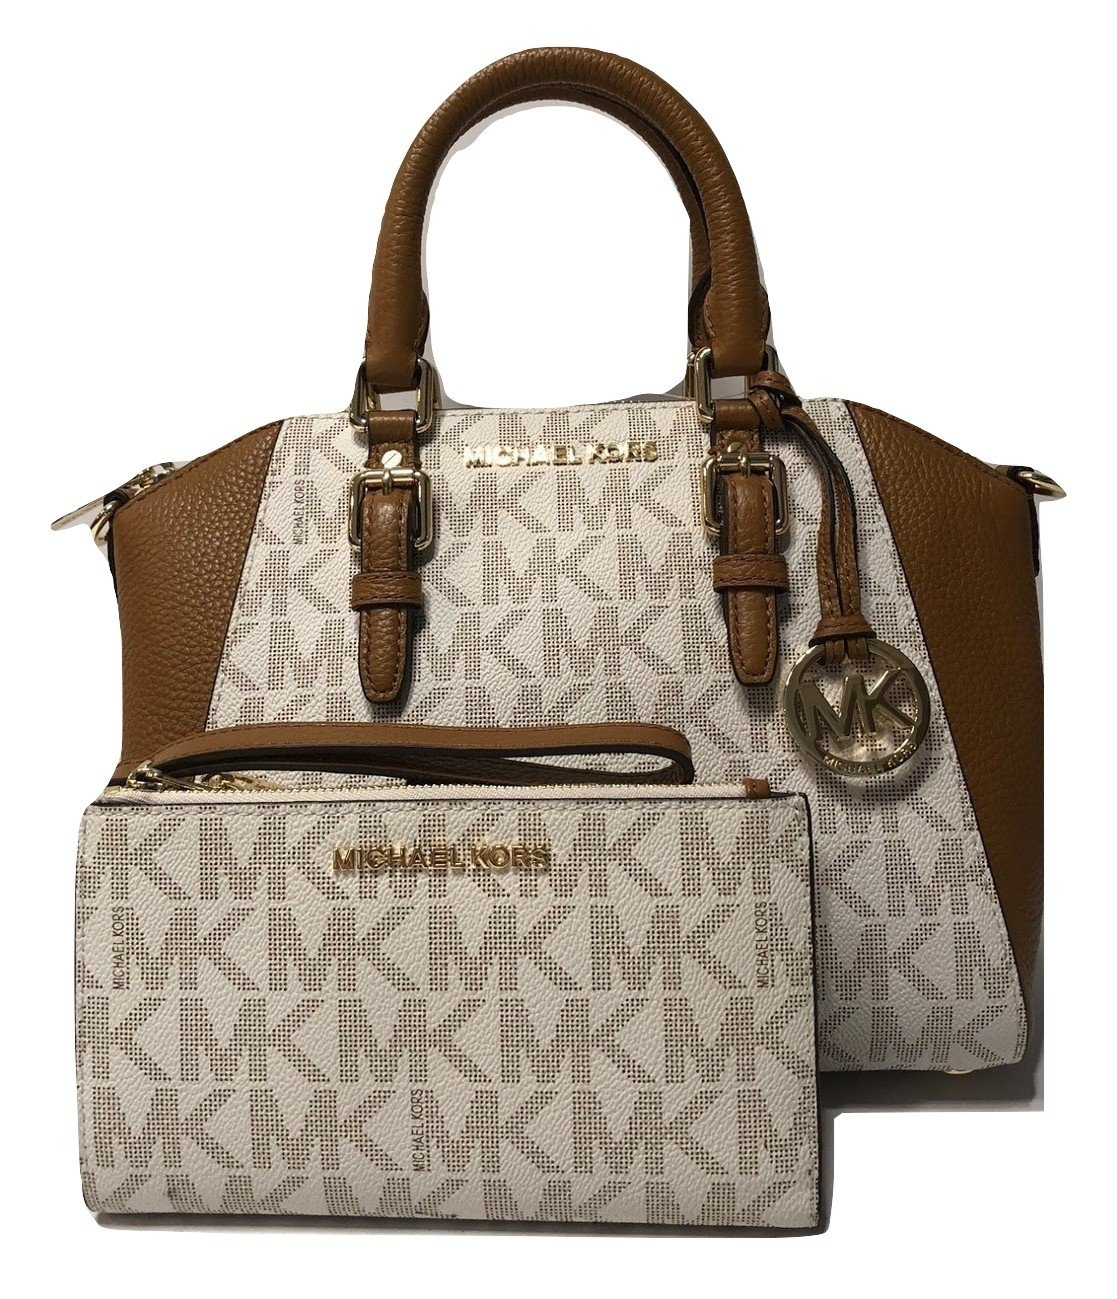 MICHAEL Michael Kors Ciara MD Messenger Handbag bundled with Michael Kors Jet Set Travel Double Zip Wallet Wristlet (Signature Vanilla/Acorn)